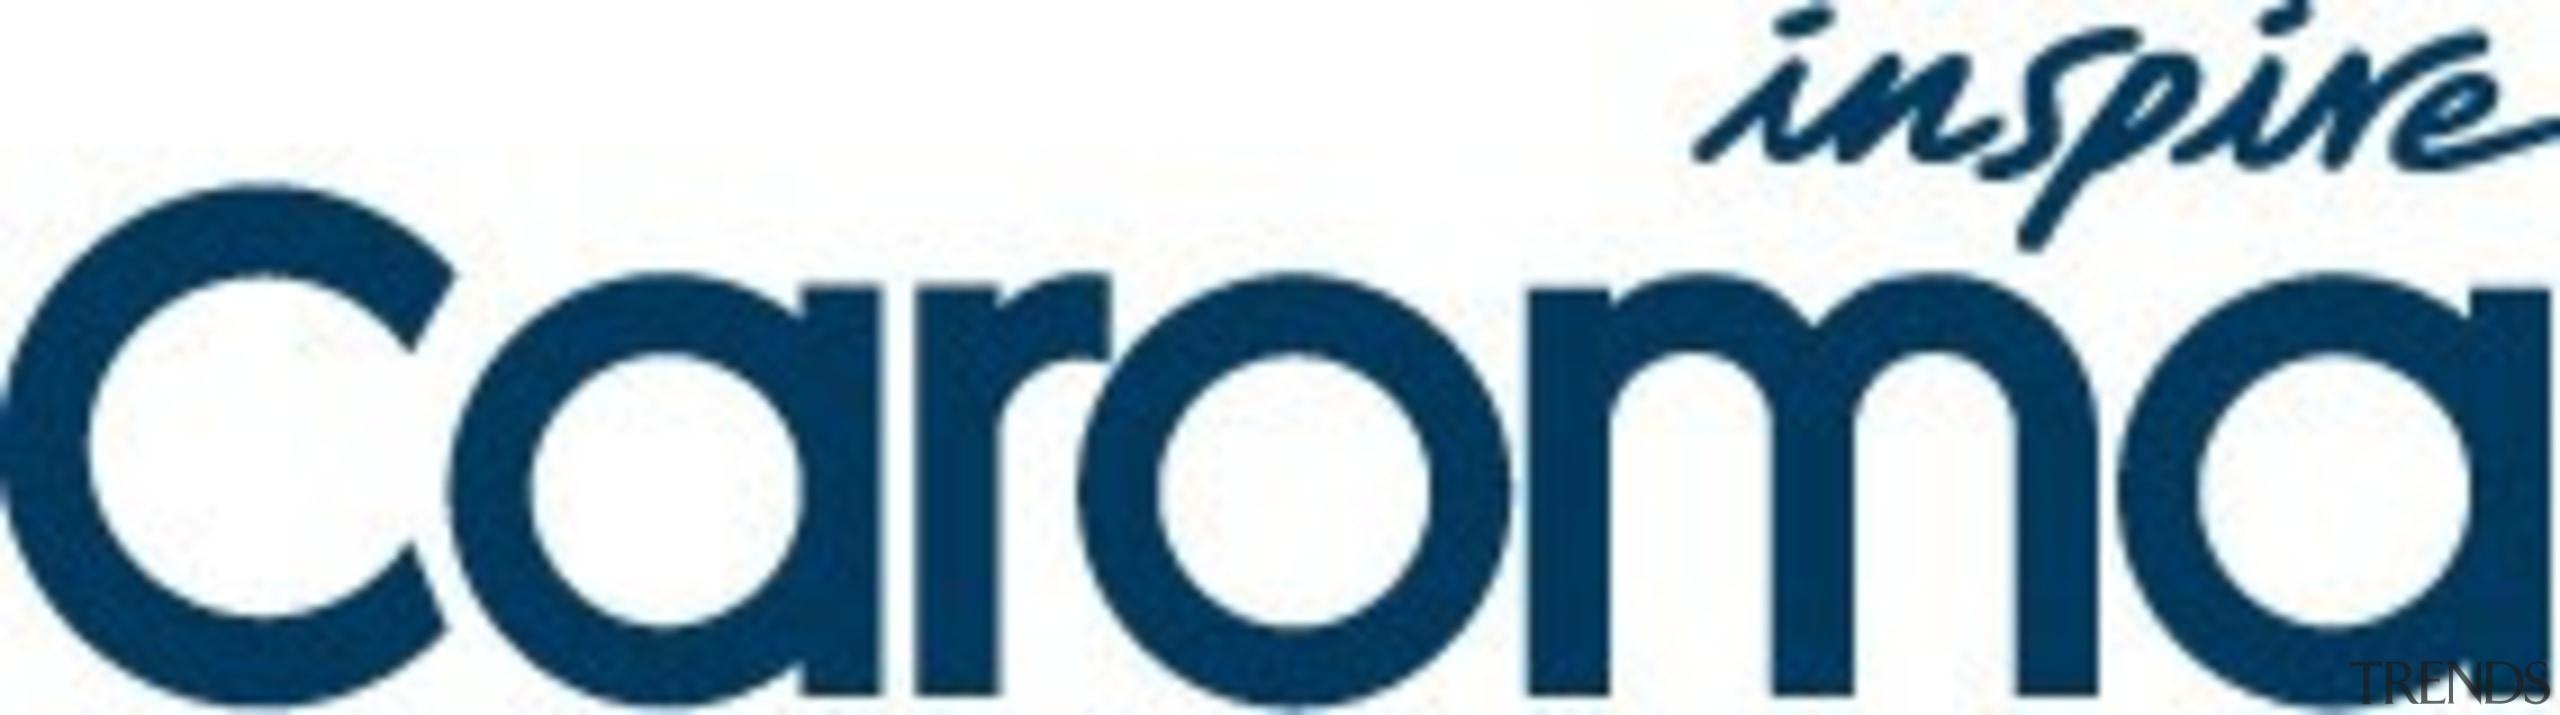 Caroma Logo - Caroma Logo - area | area, banner, blue, brand, design, font, line, logo, organization, product, signage, text, white, blue